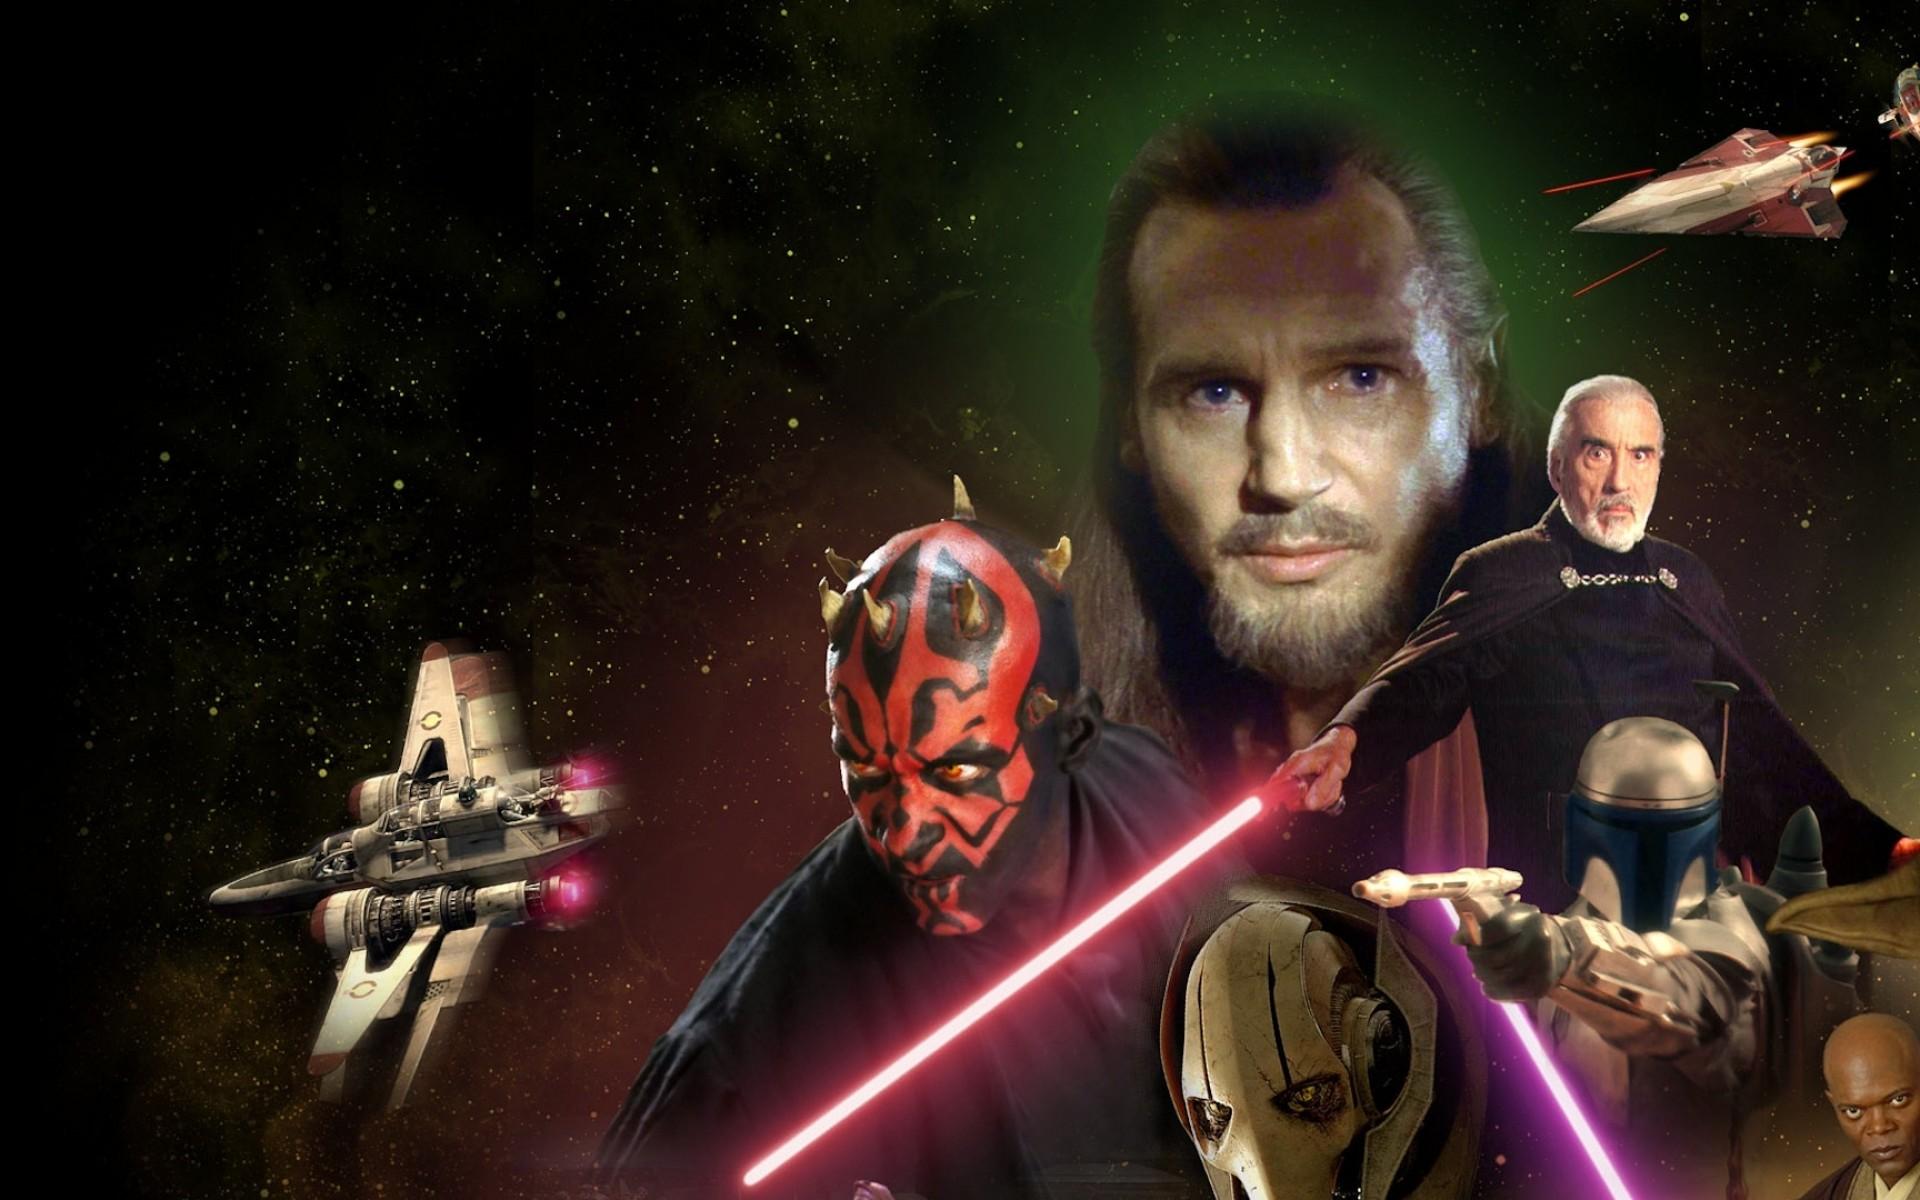 star wars lightsabers darth vader sith chewbacca jabba the hutt quigon jinn 5760×1080  wallpaper Art HD